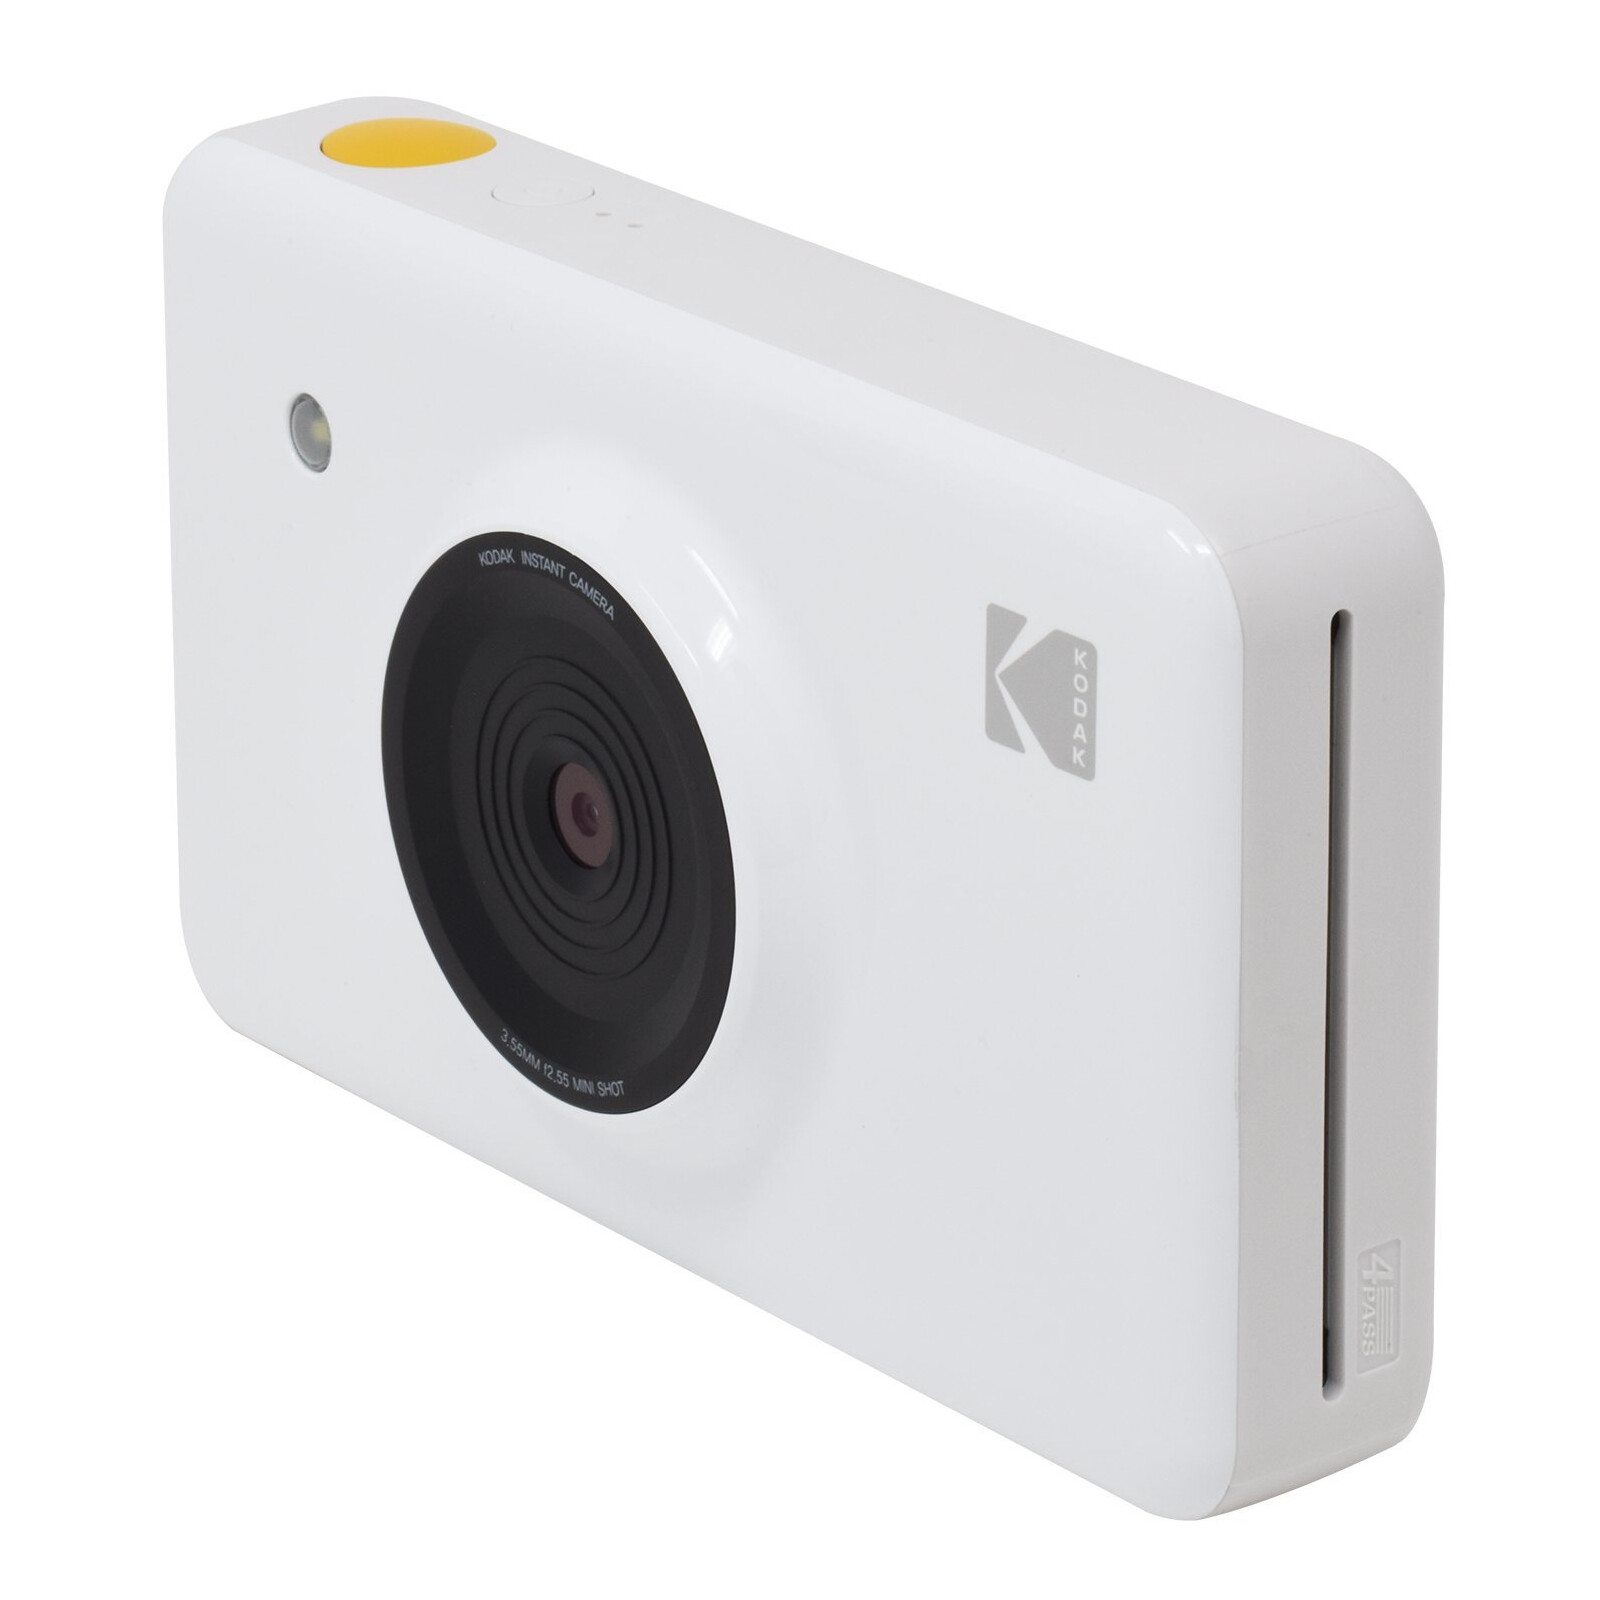 Kodak Minishot Instant Camera